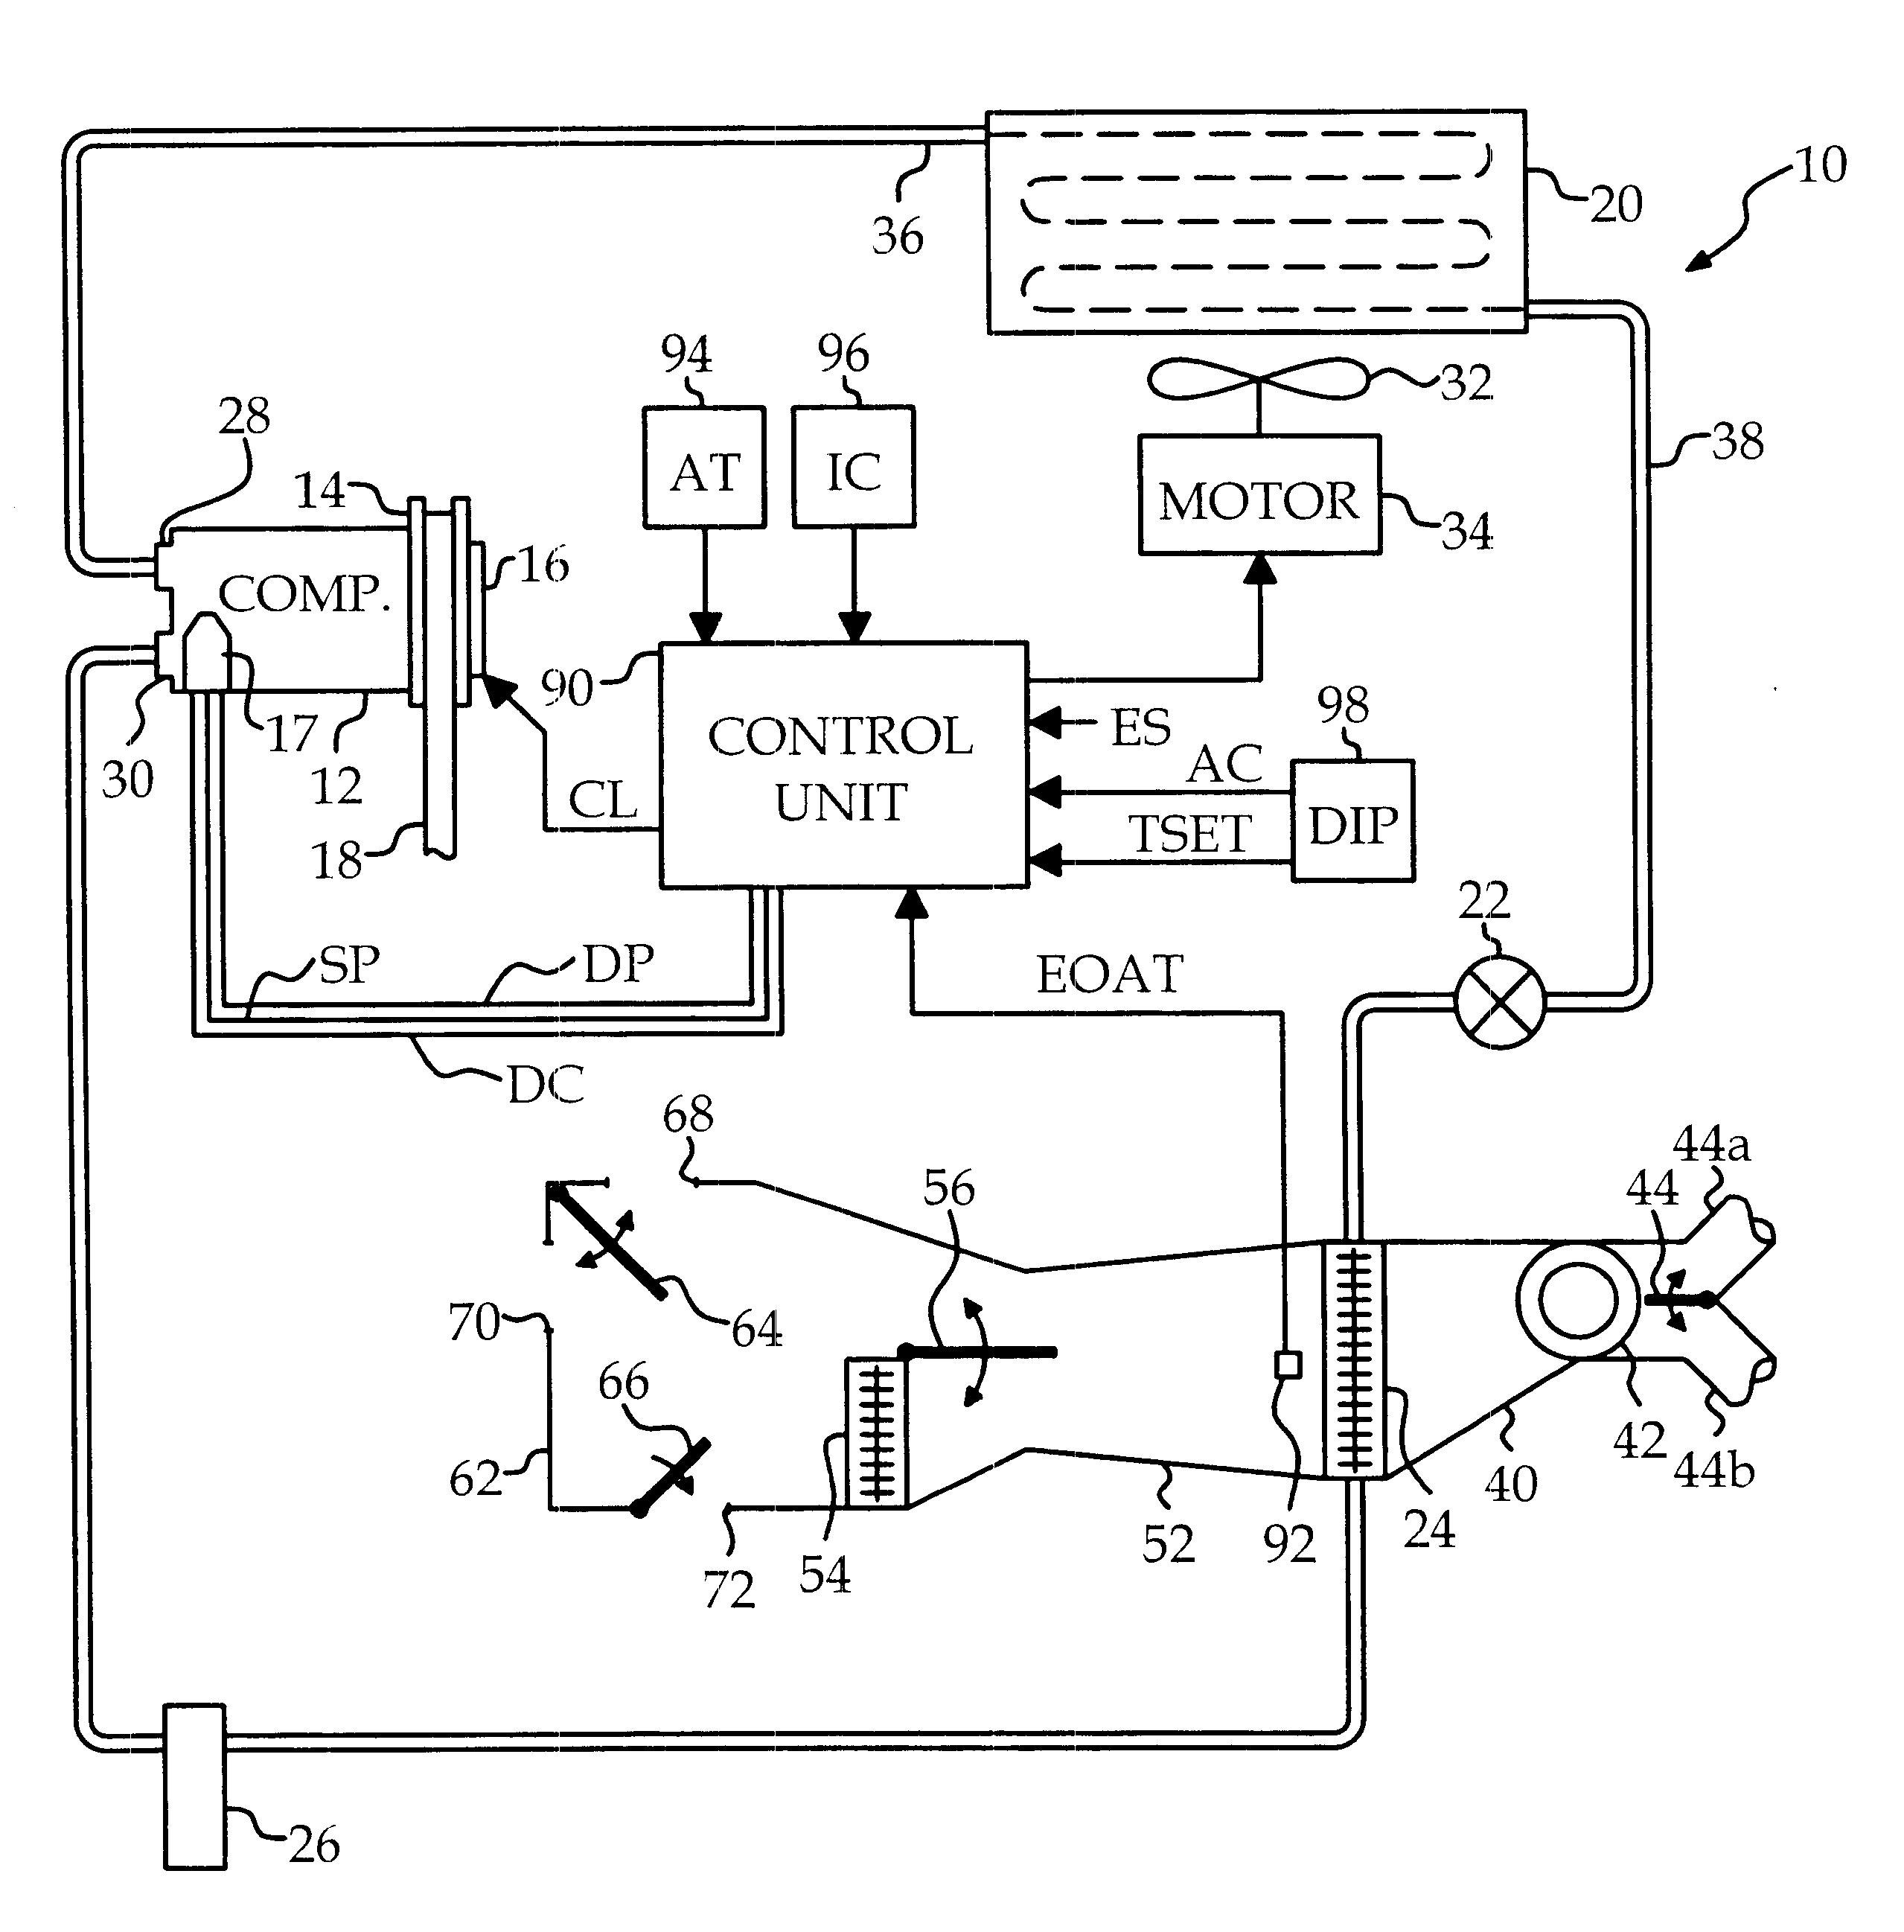 tags: #modine pa50 wiring#modine heater parts diagram#modine wiring diagram  pdf#modine gas heaters wiring schematic#modine pd 50aa0111 wiring diagram# modine